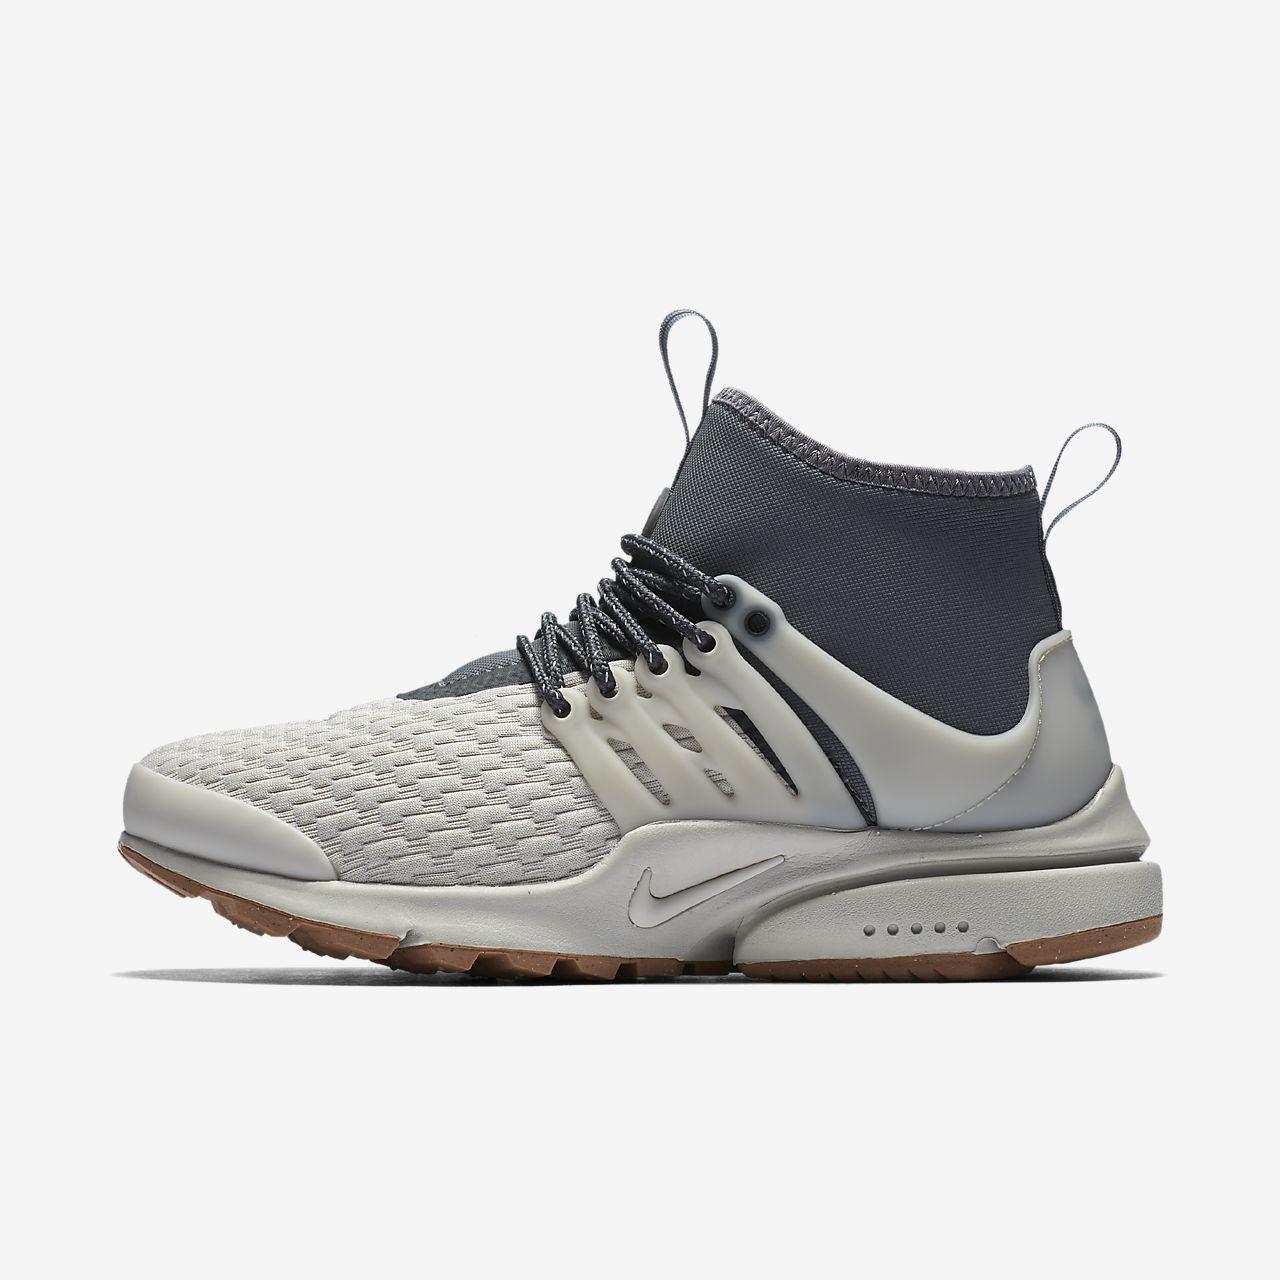 ... Nike Air Presto Mid Utility Premium Women\u0027s Shoe